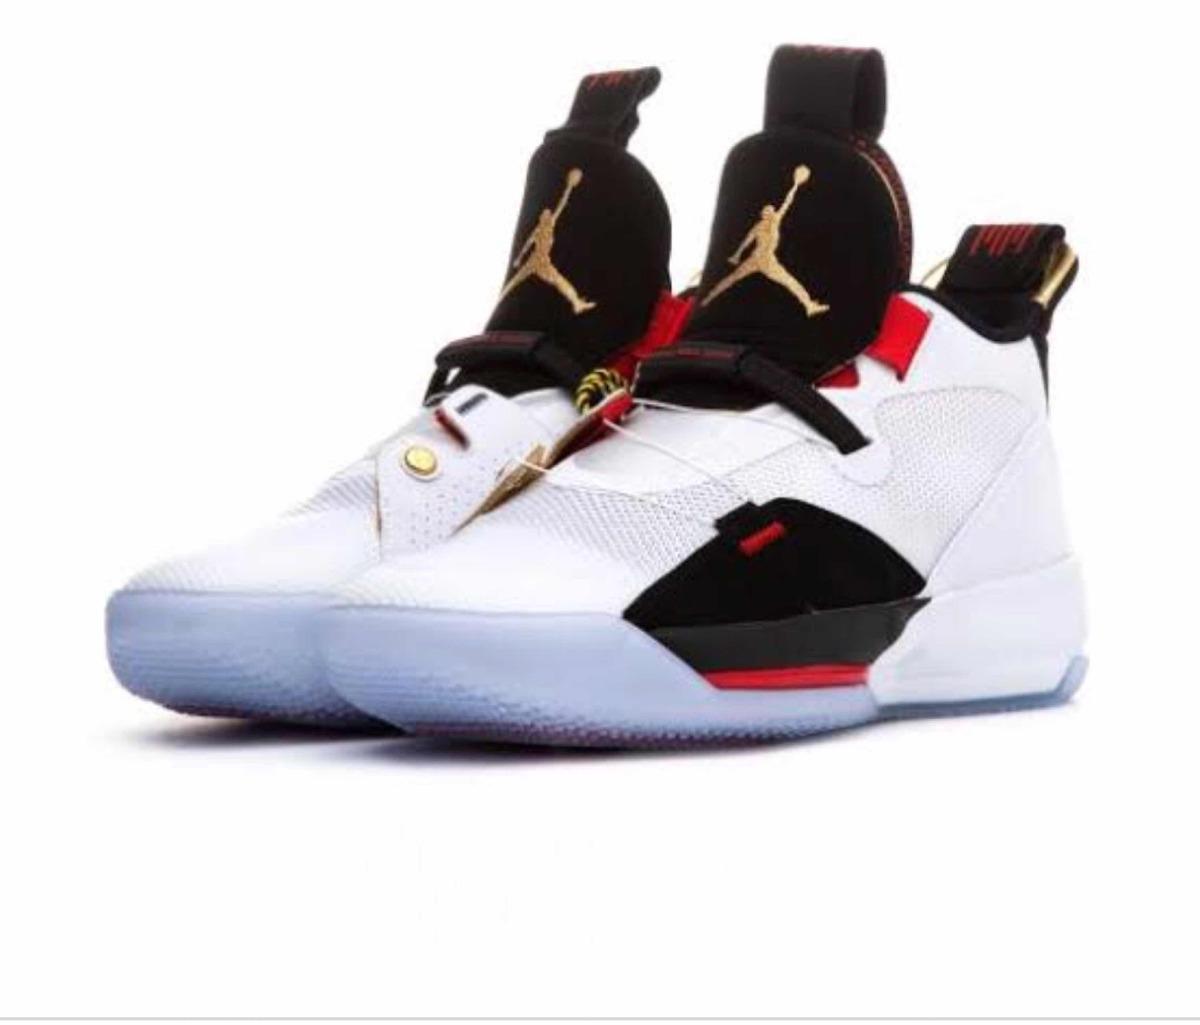 33 Future Jordan Of Tenis Flight Nike Xxxiii Original Nuevos Onw8PkX0